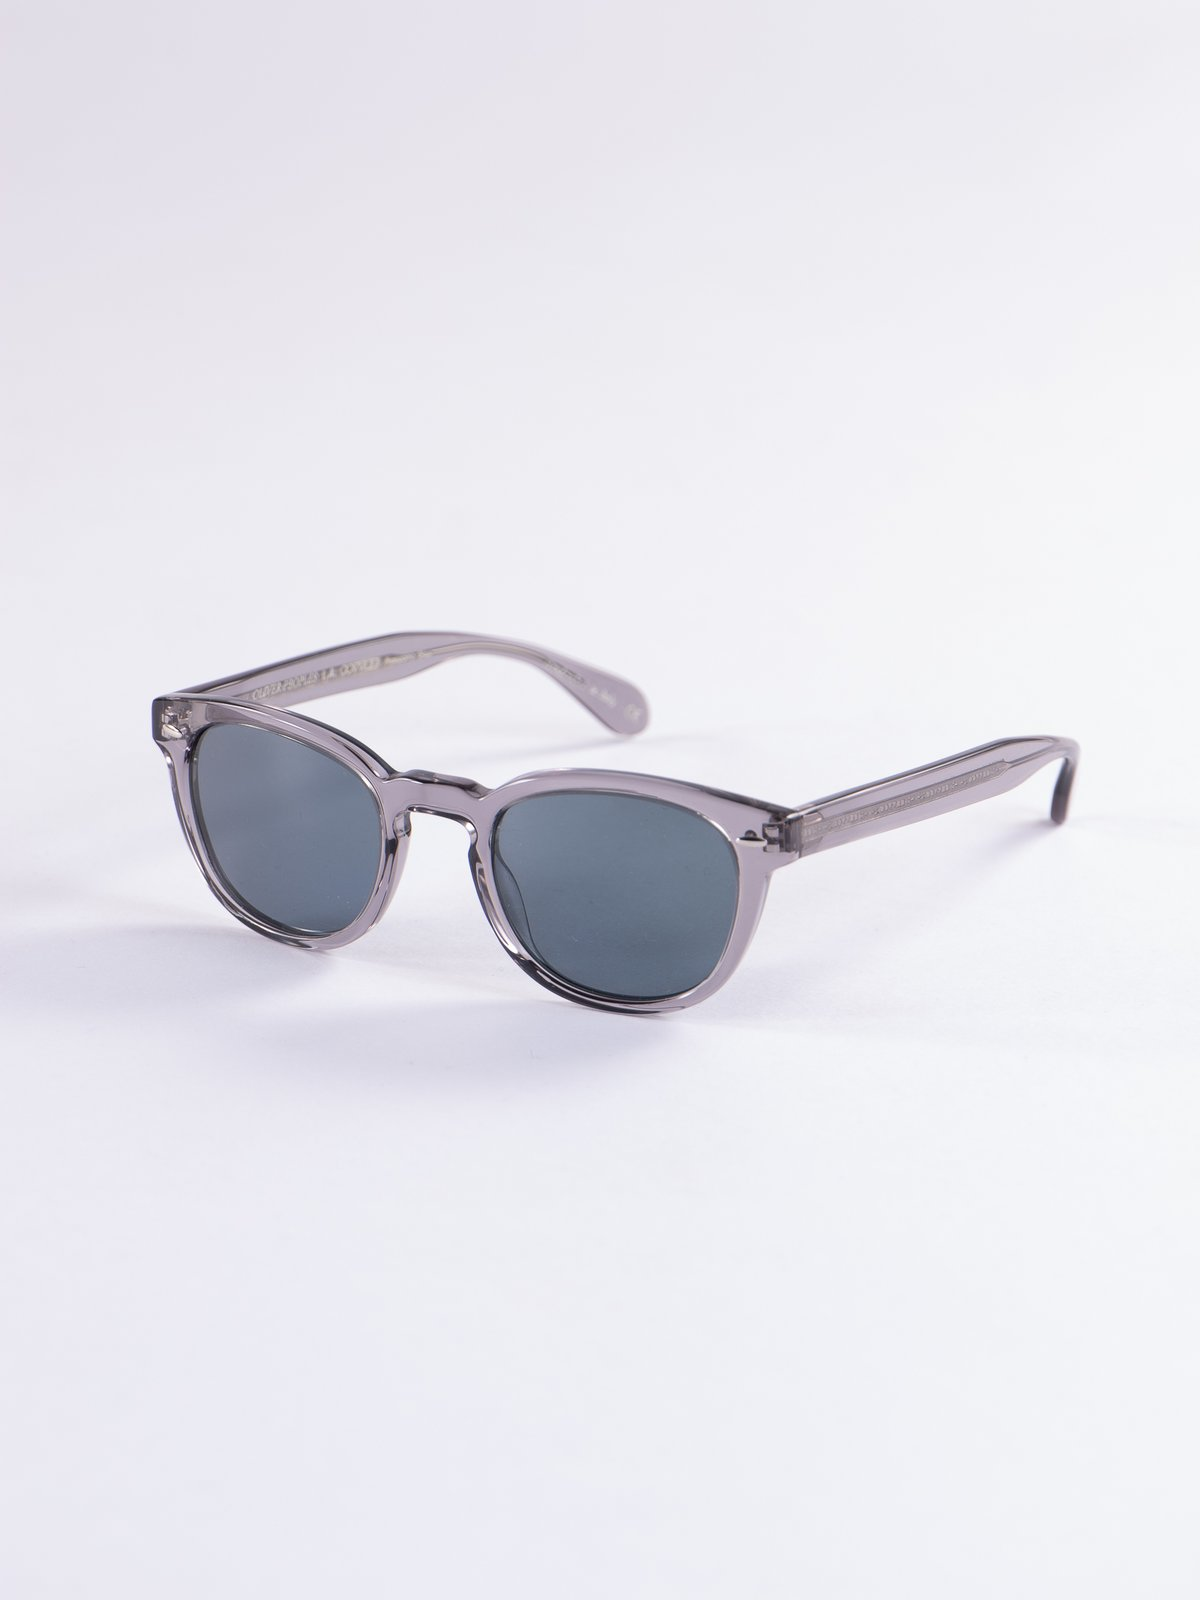 Workman Grey Sheldrake Sunglasses - Image 3